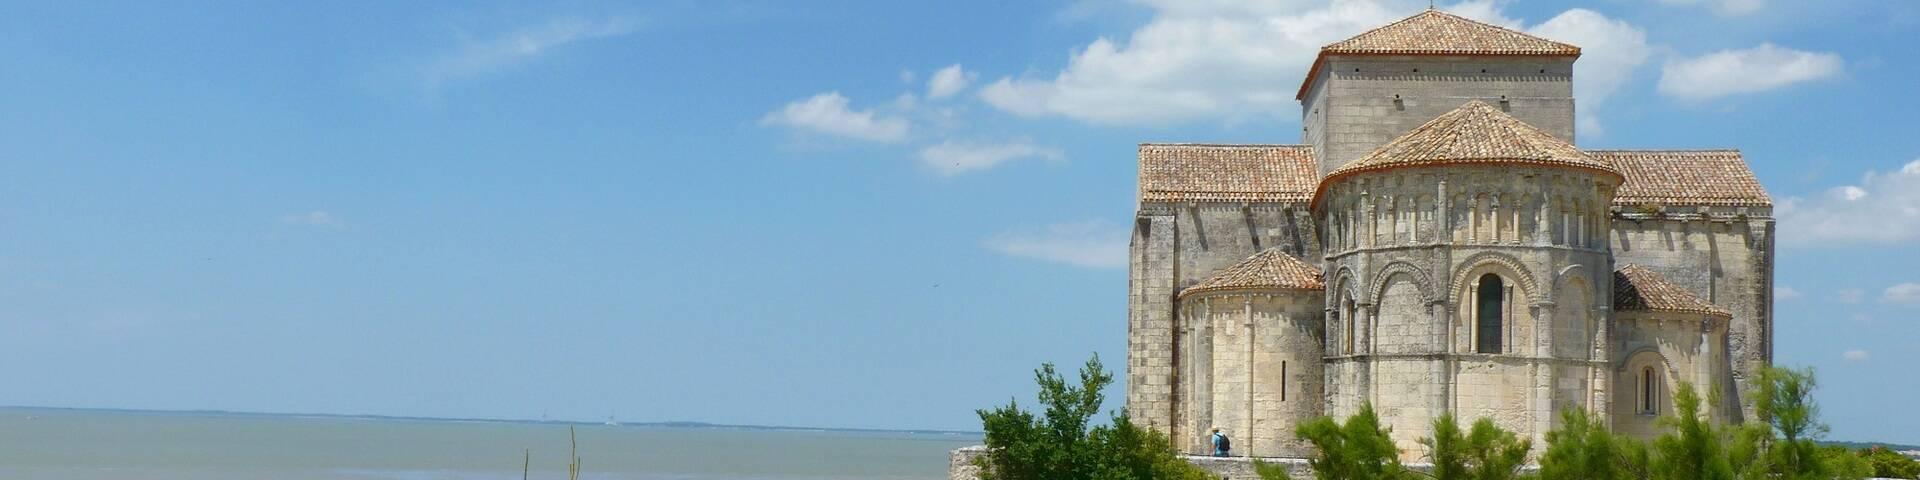 L'église Sainte-Radagonde de Talmont - ©P.Migaud / FDHPA17